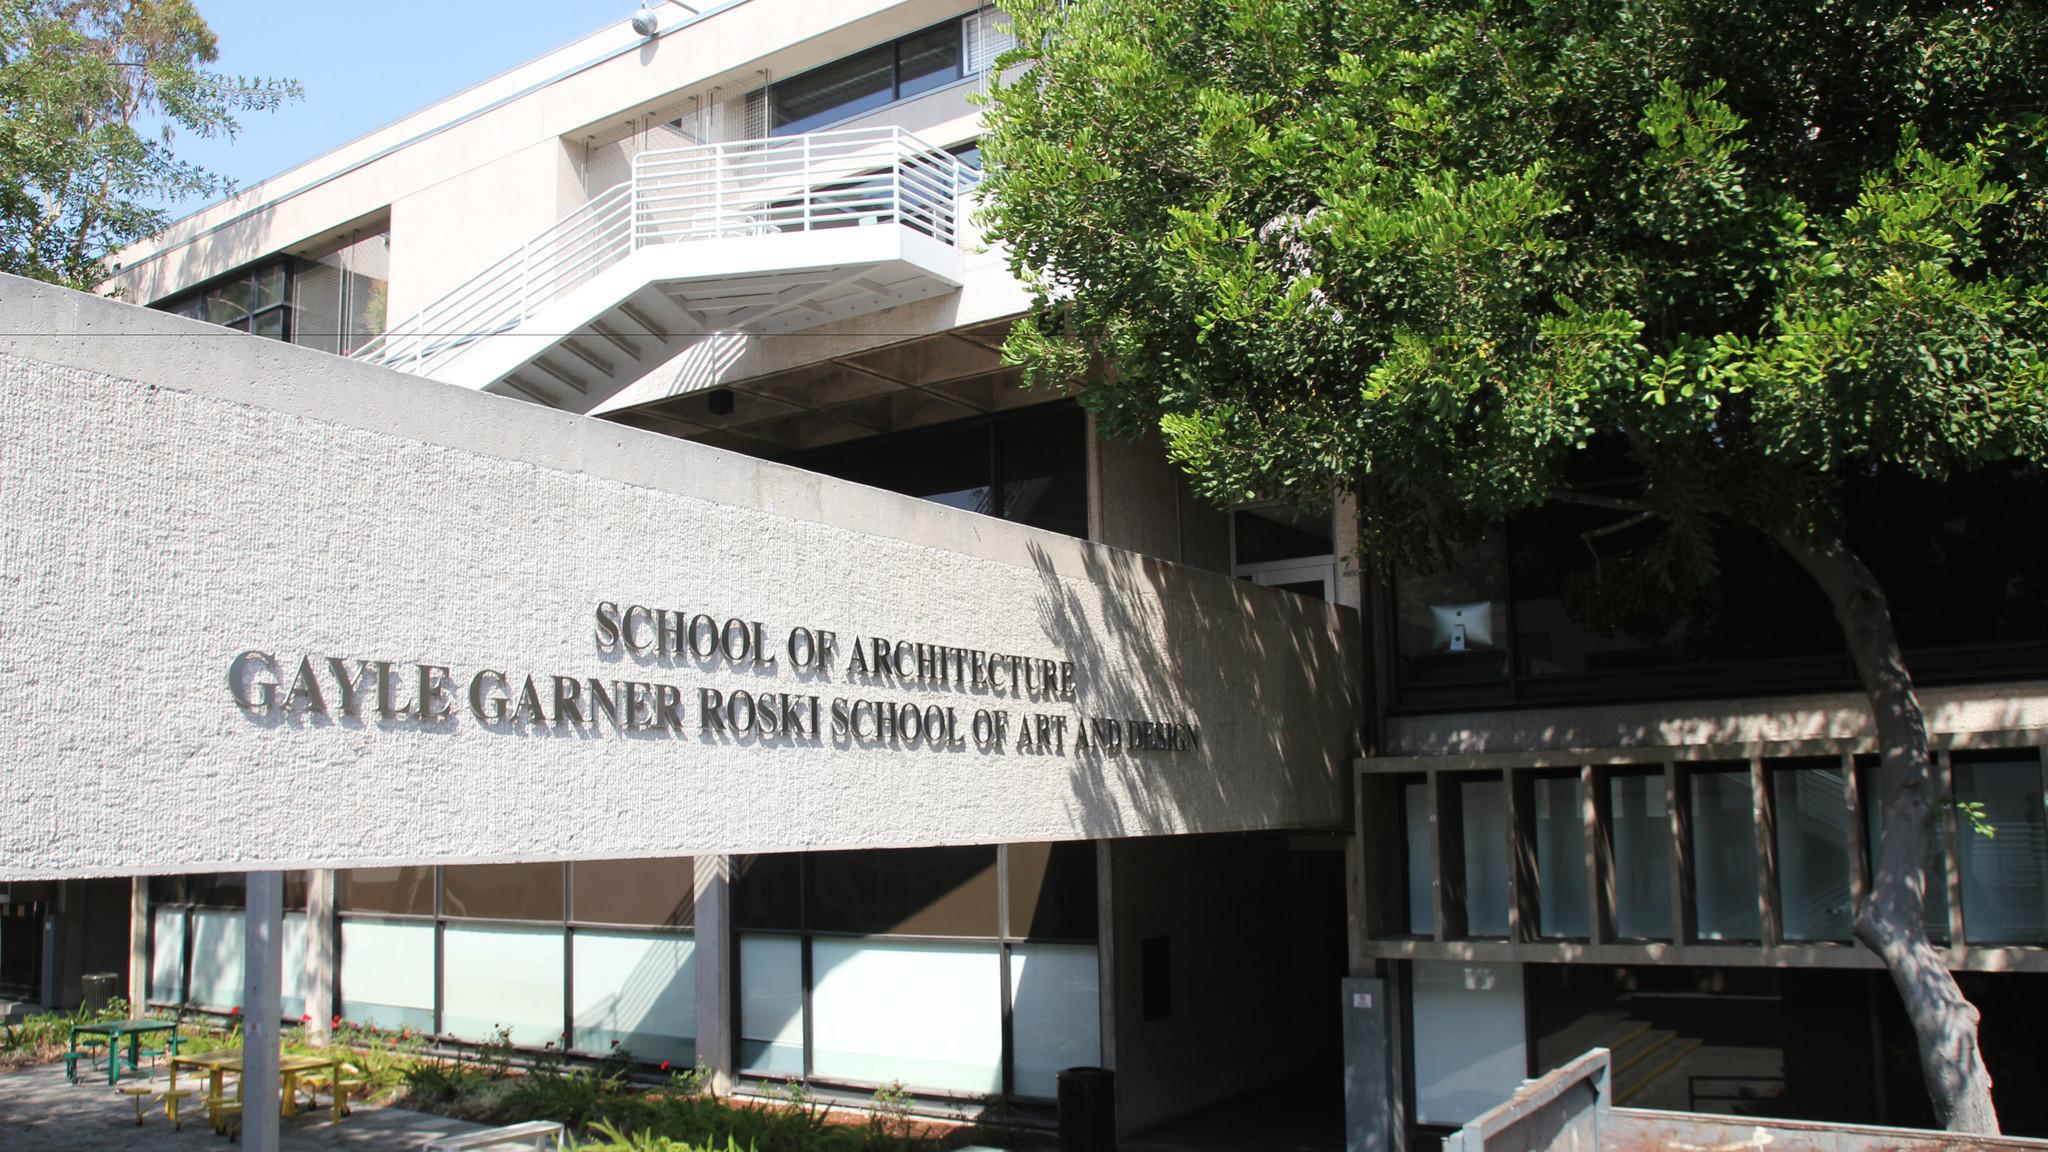 Usc Roski School Of Art And Design Mfa Program